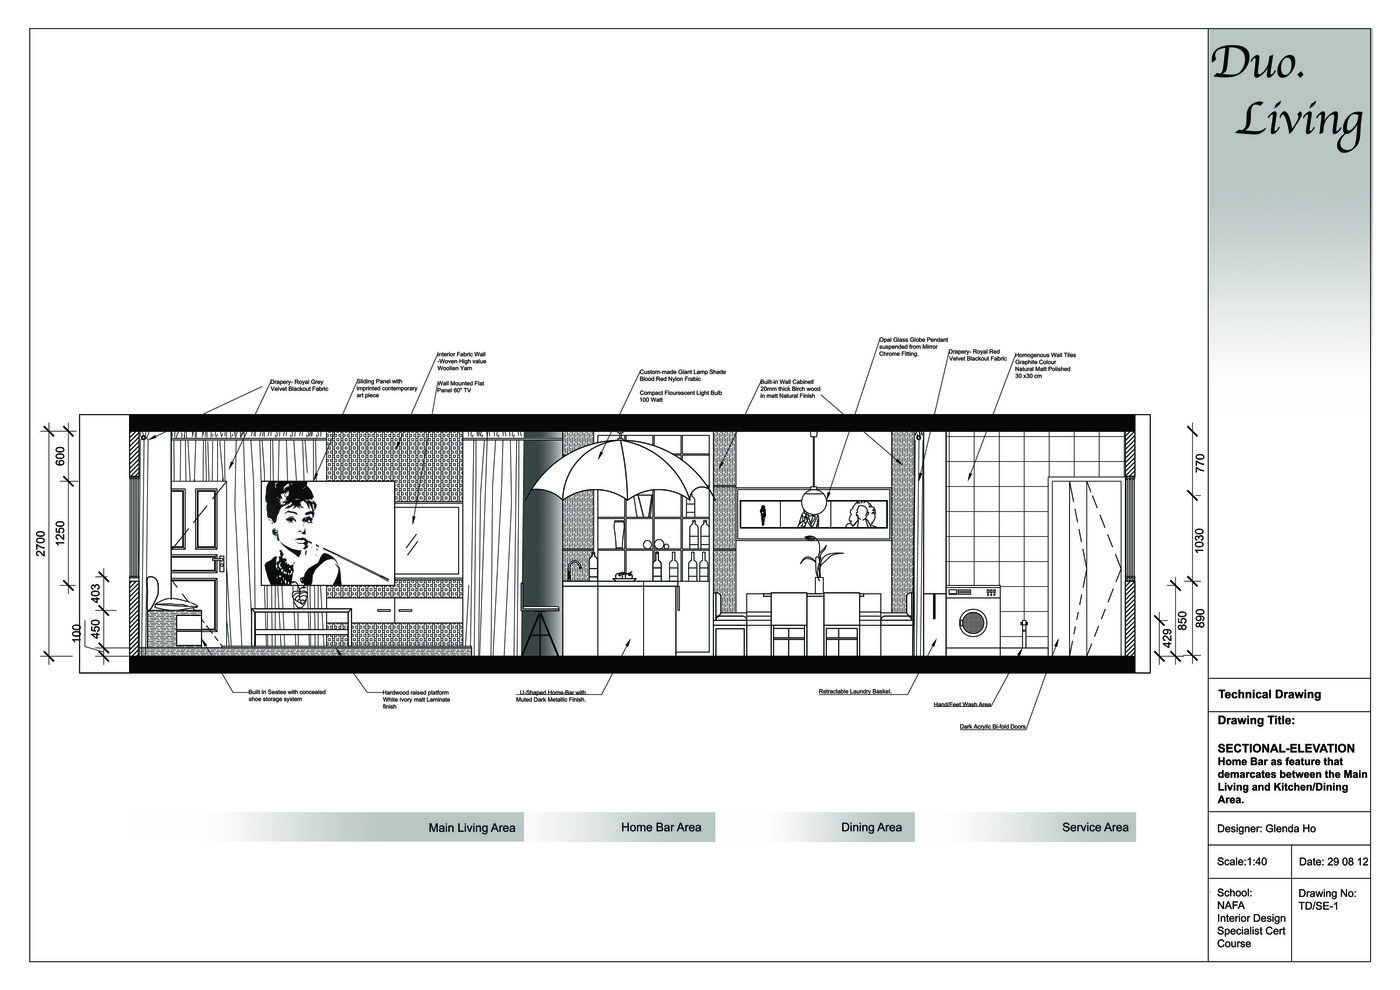 DuoLiving Home Design By Glenda Ho At